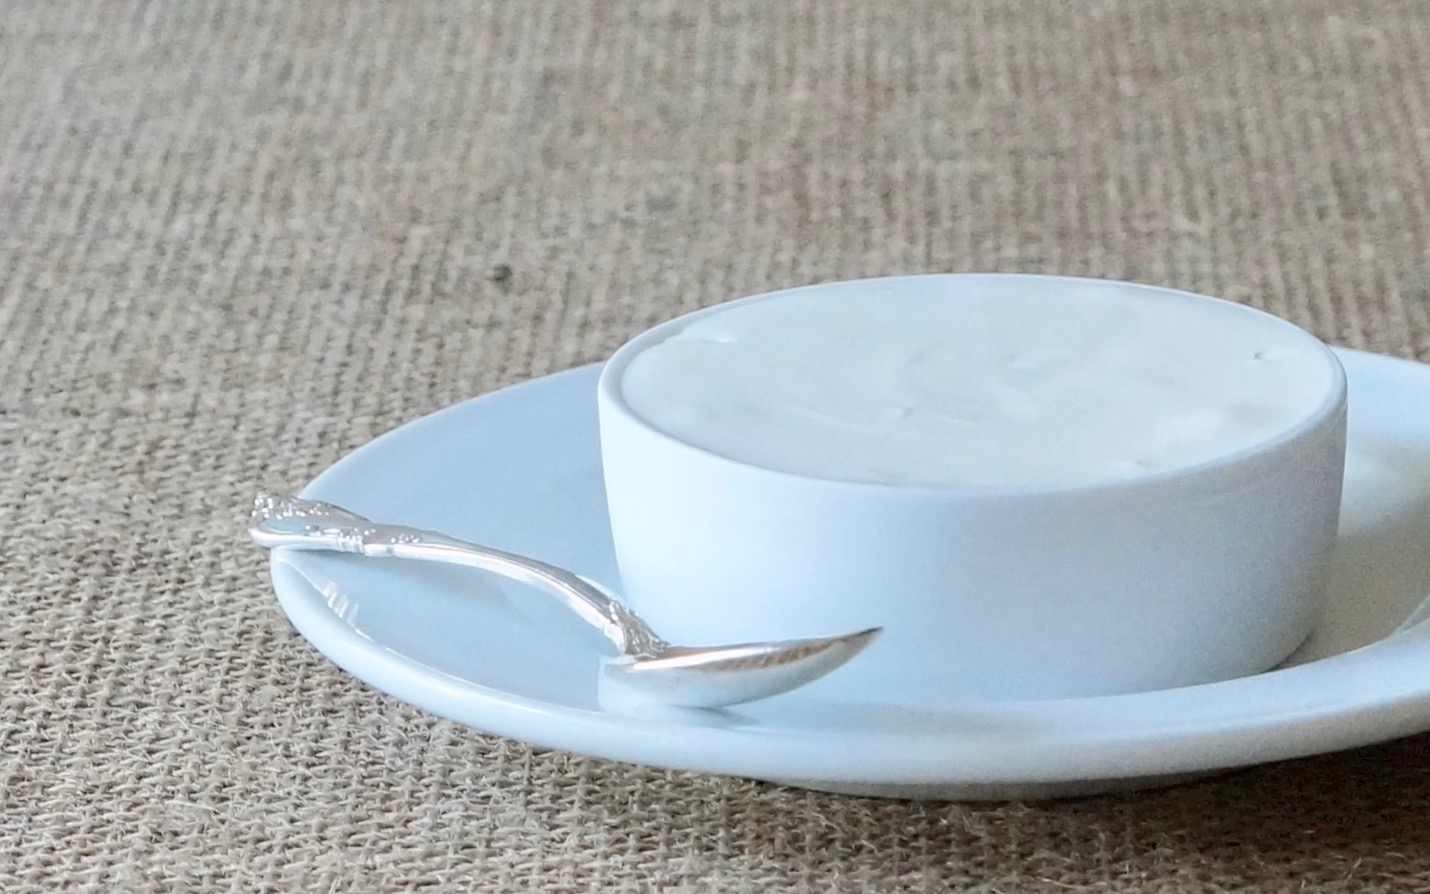 Sour-Cream-Cooking-Essentials-Rebecca-Gordon-Editor-In-Chief-Buttermilk-Lipstick-Culinary-Techniques-RebeccaGordon-Southern-Entertaining-Pastry-Chef-Birmingham-Alabama